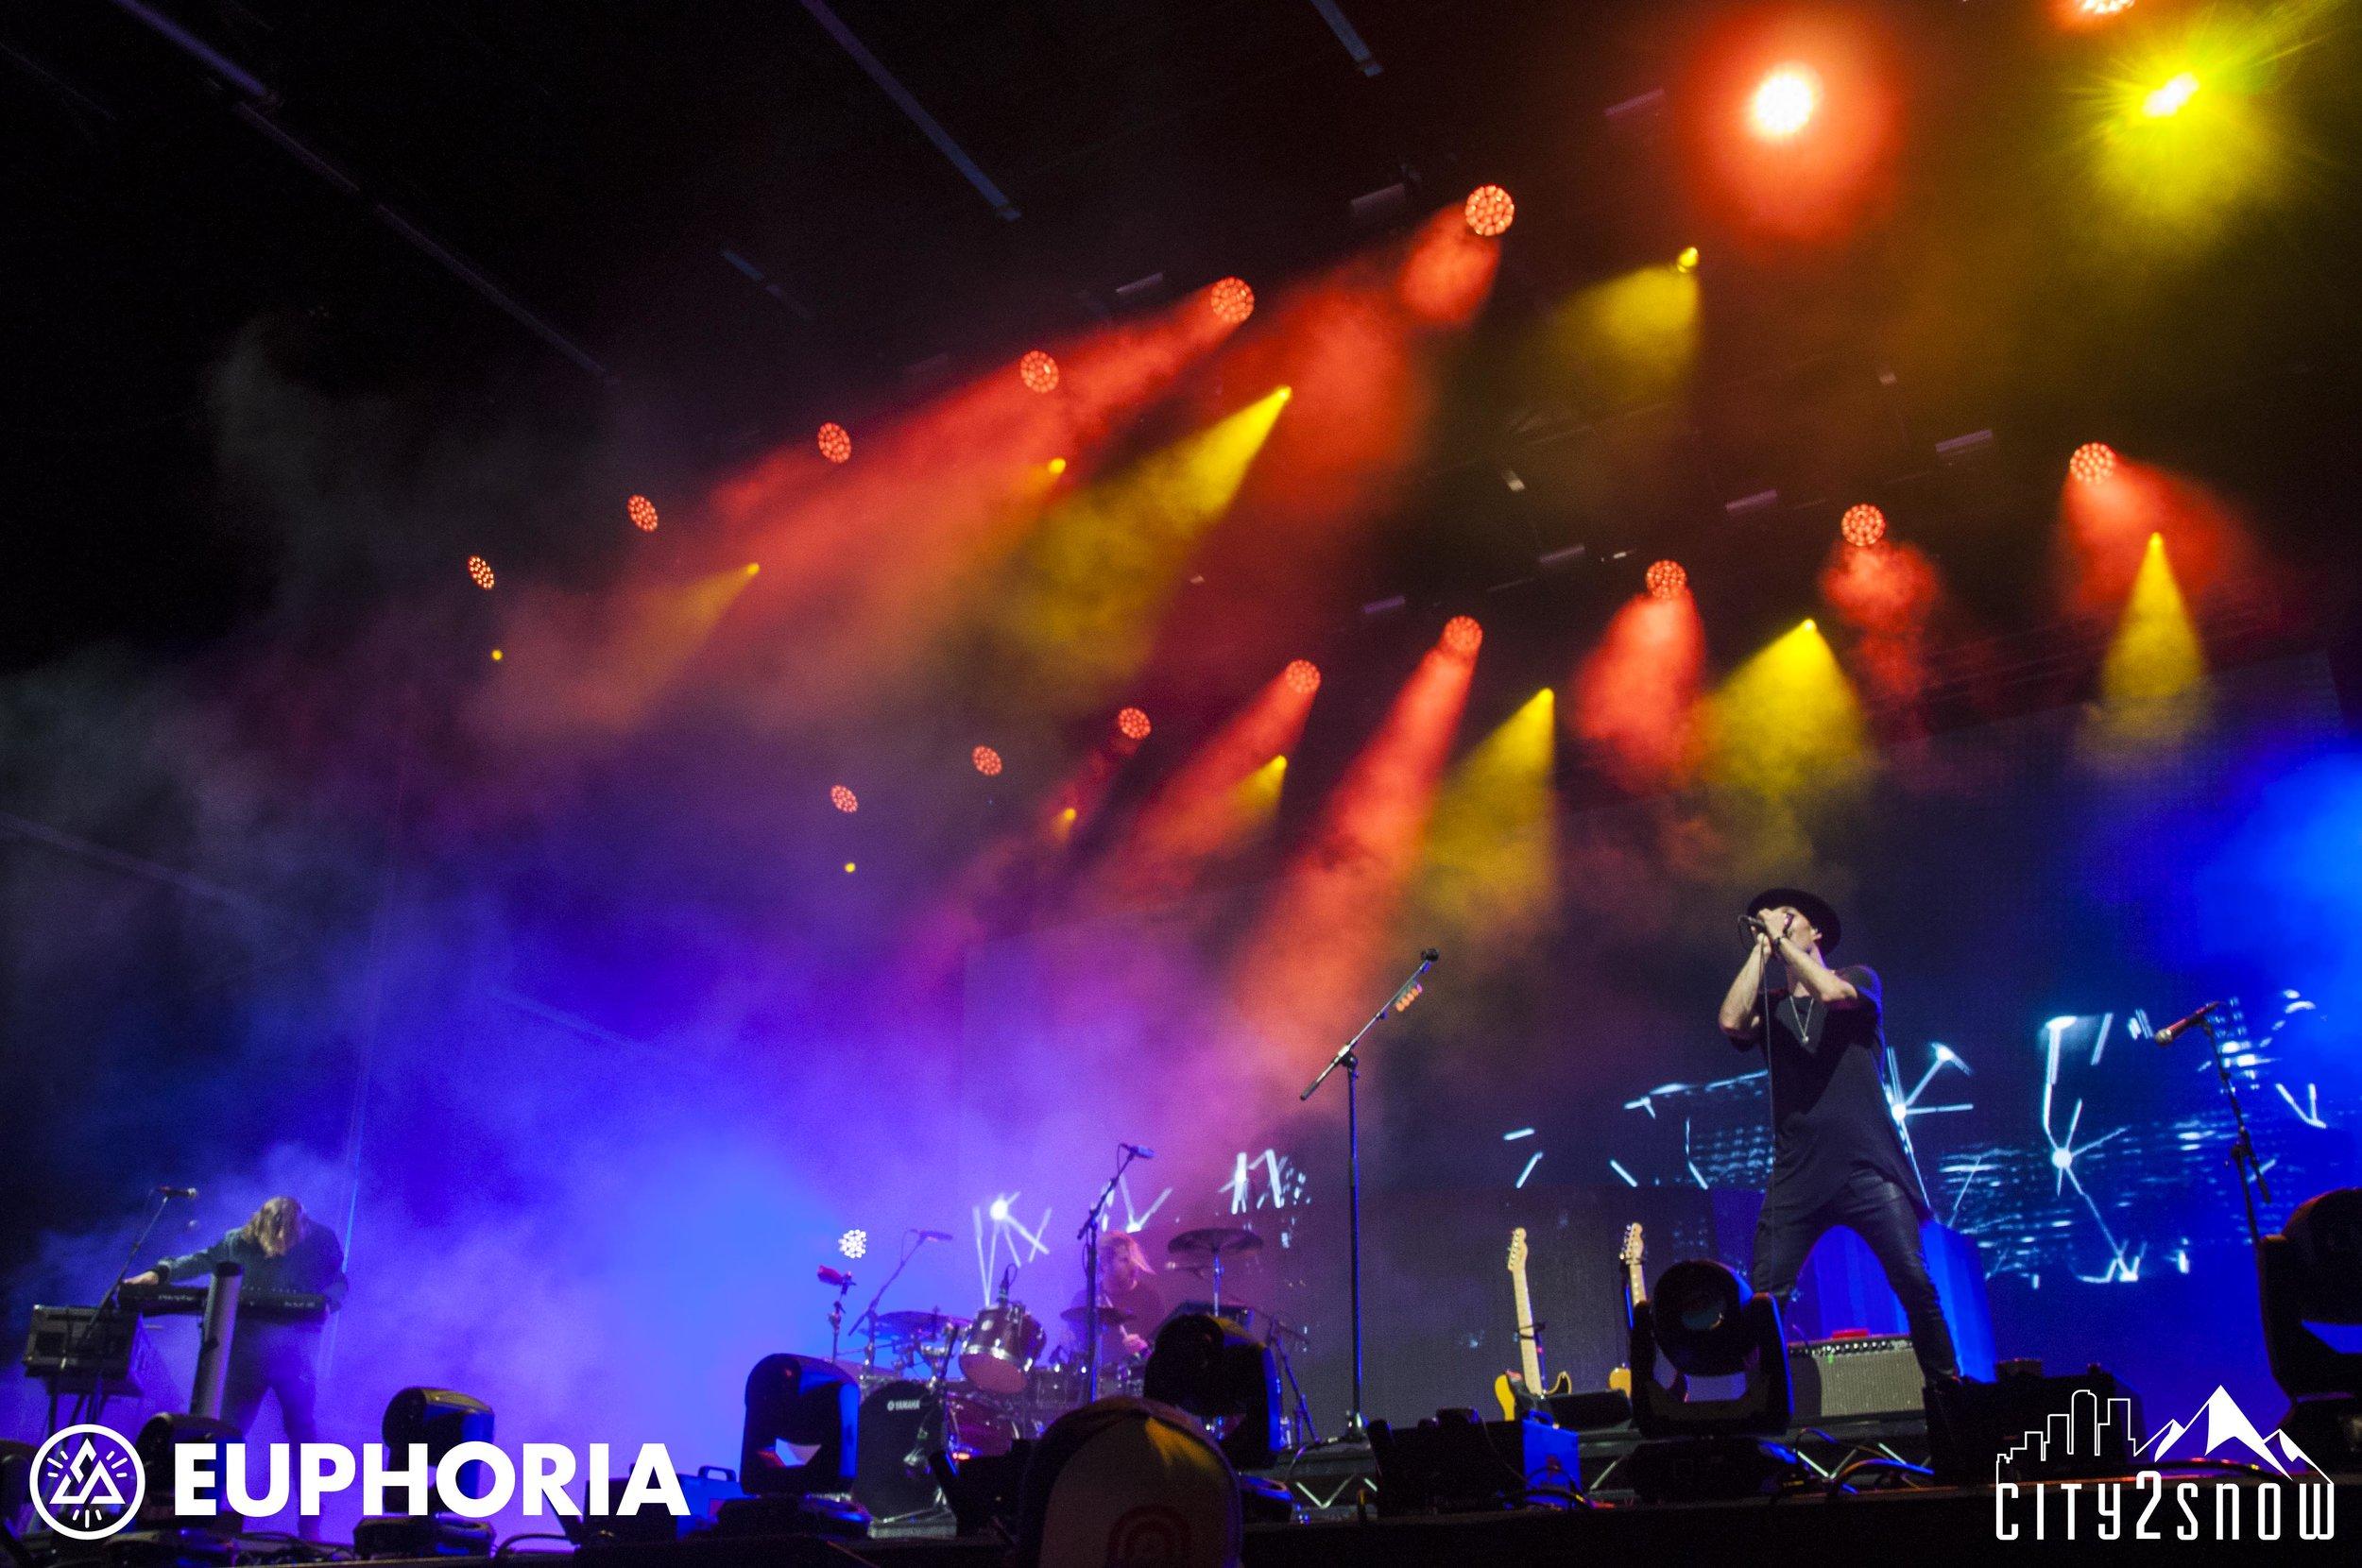 Euphoria-Music-Festival-2017-5.jpg